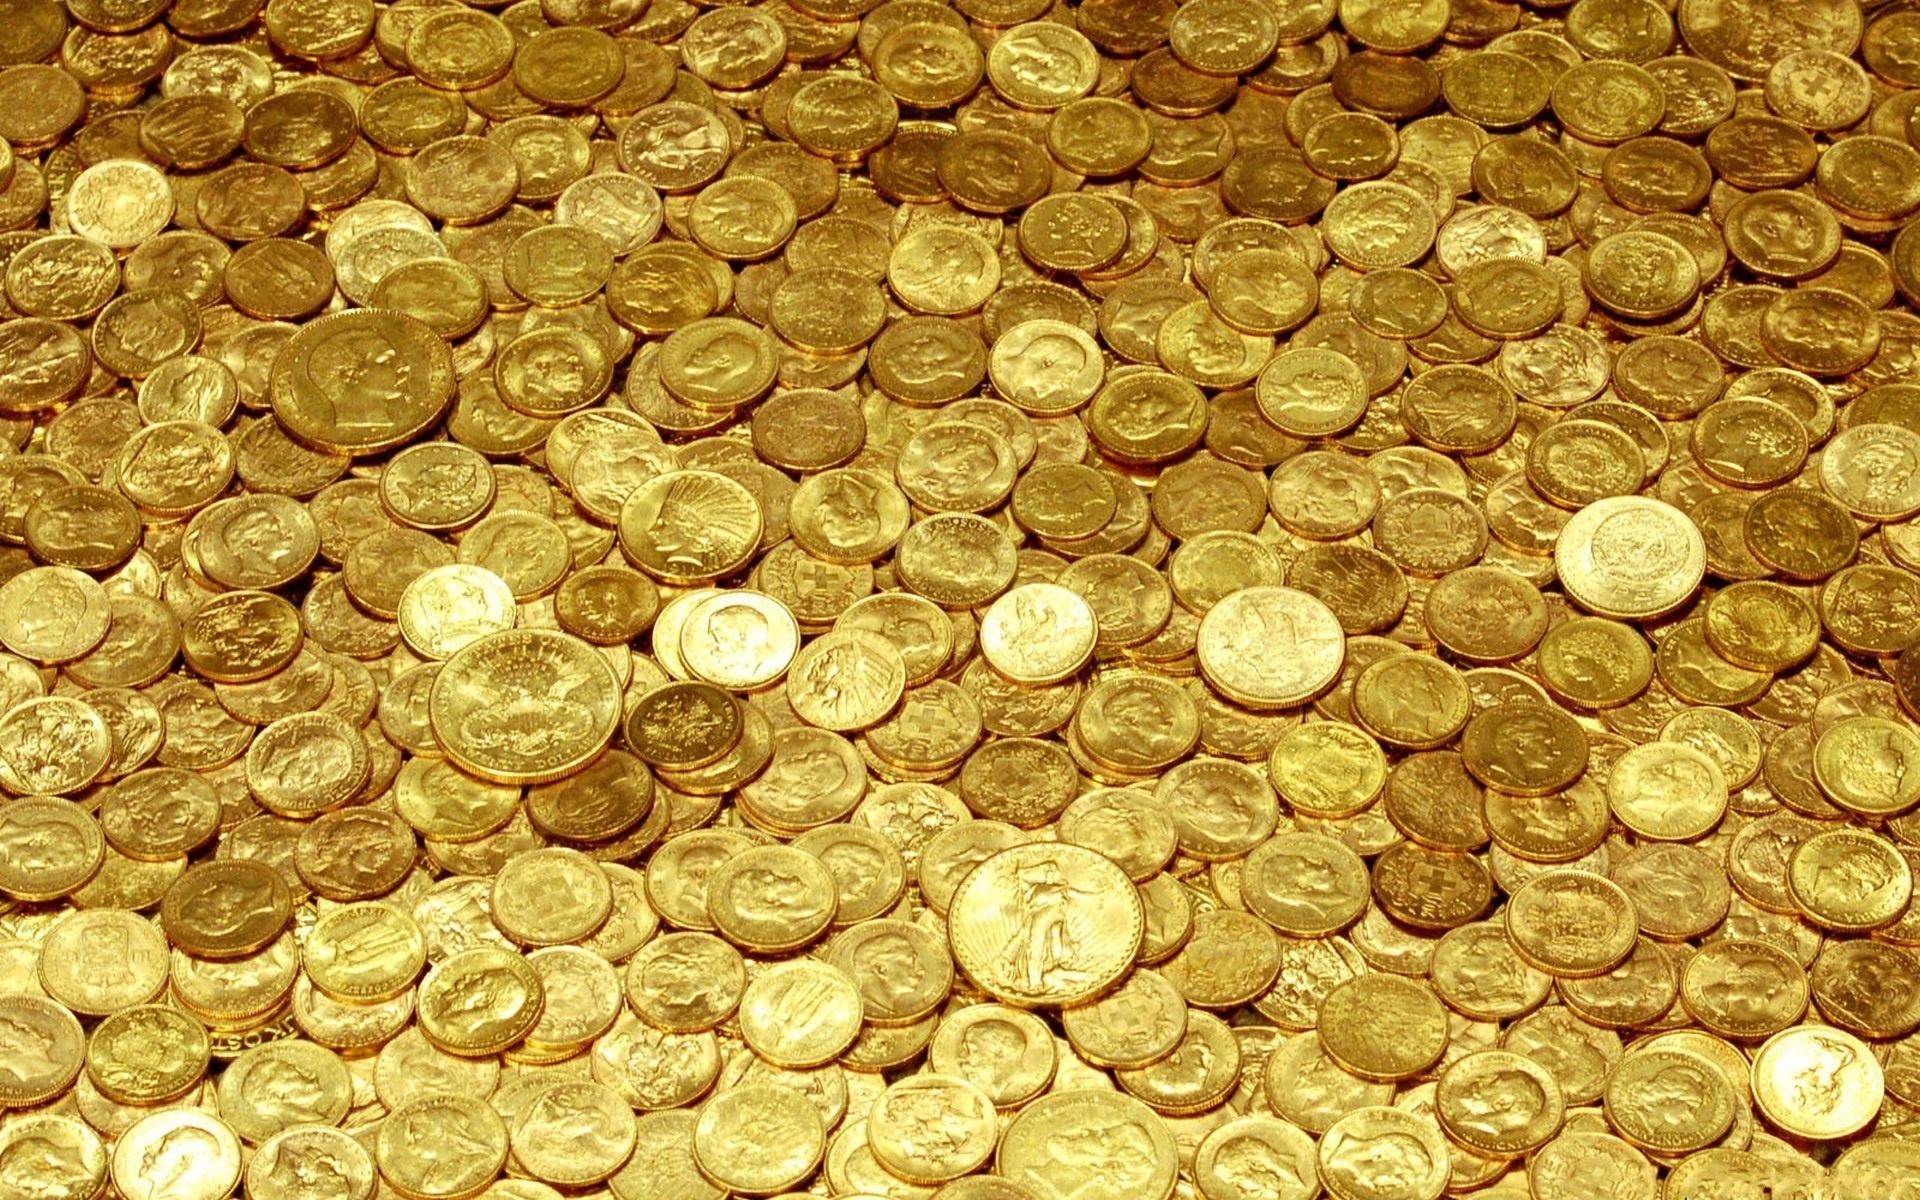 монеты, мелочь, металл